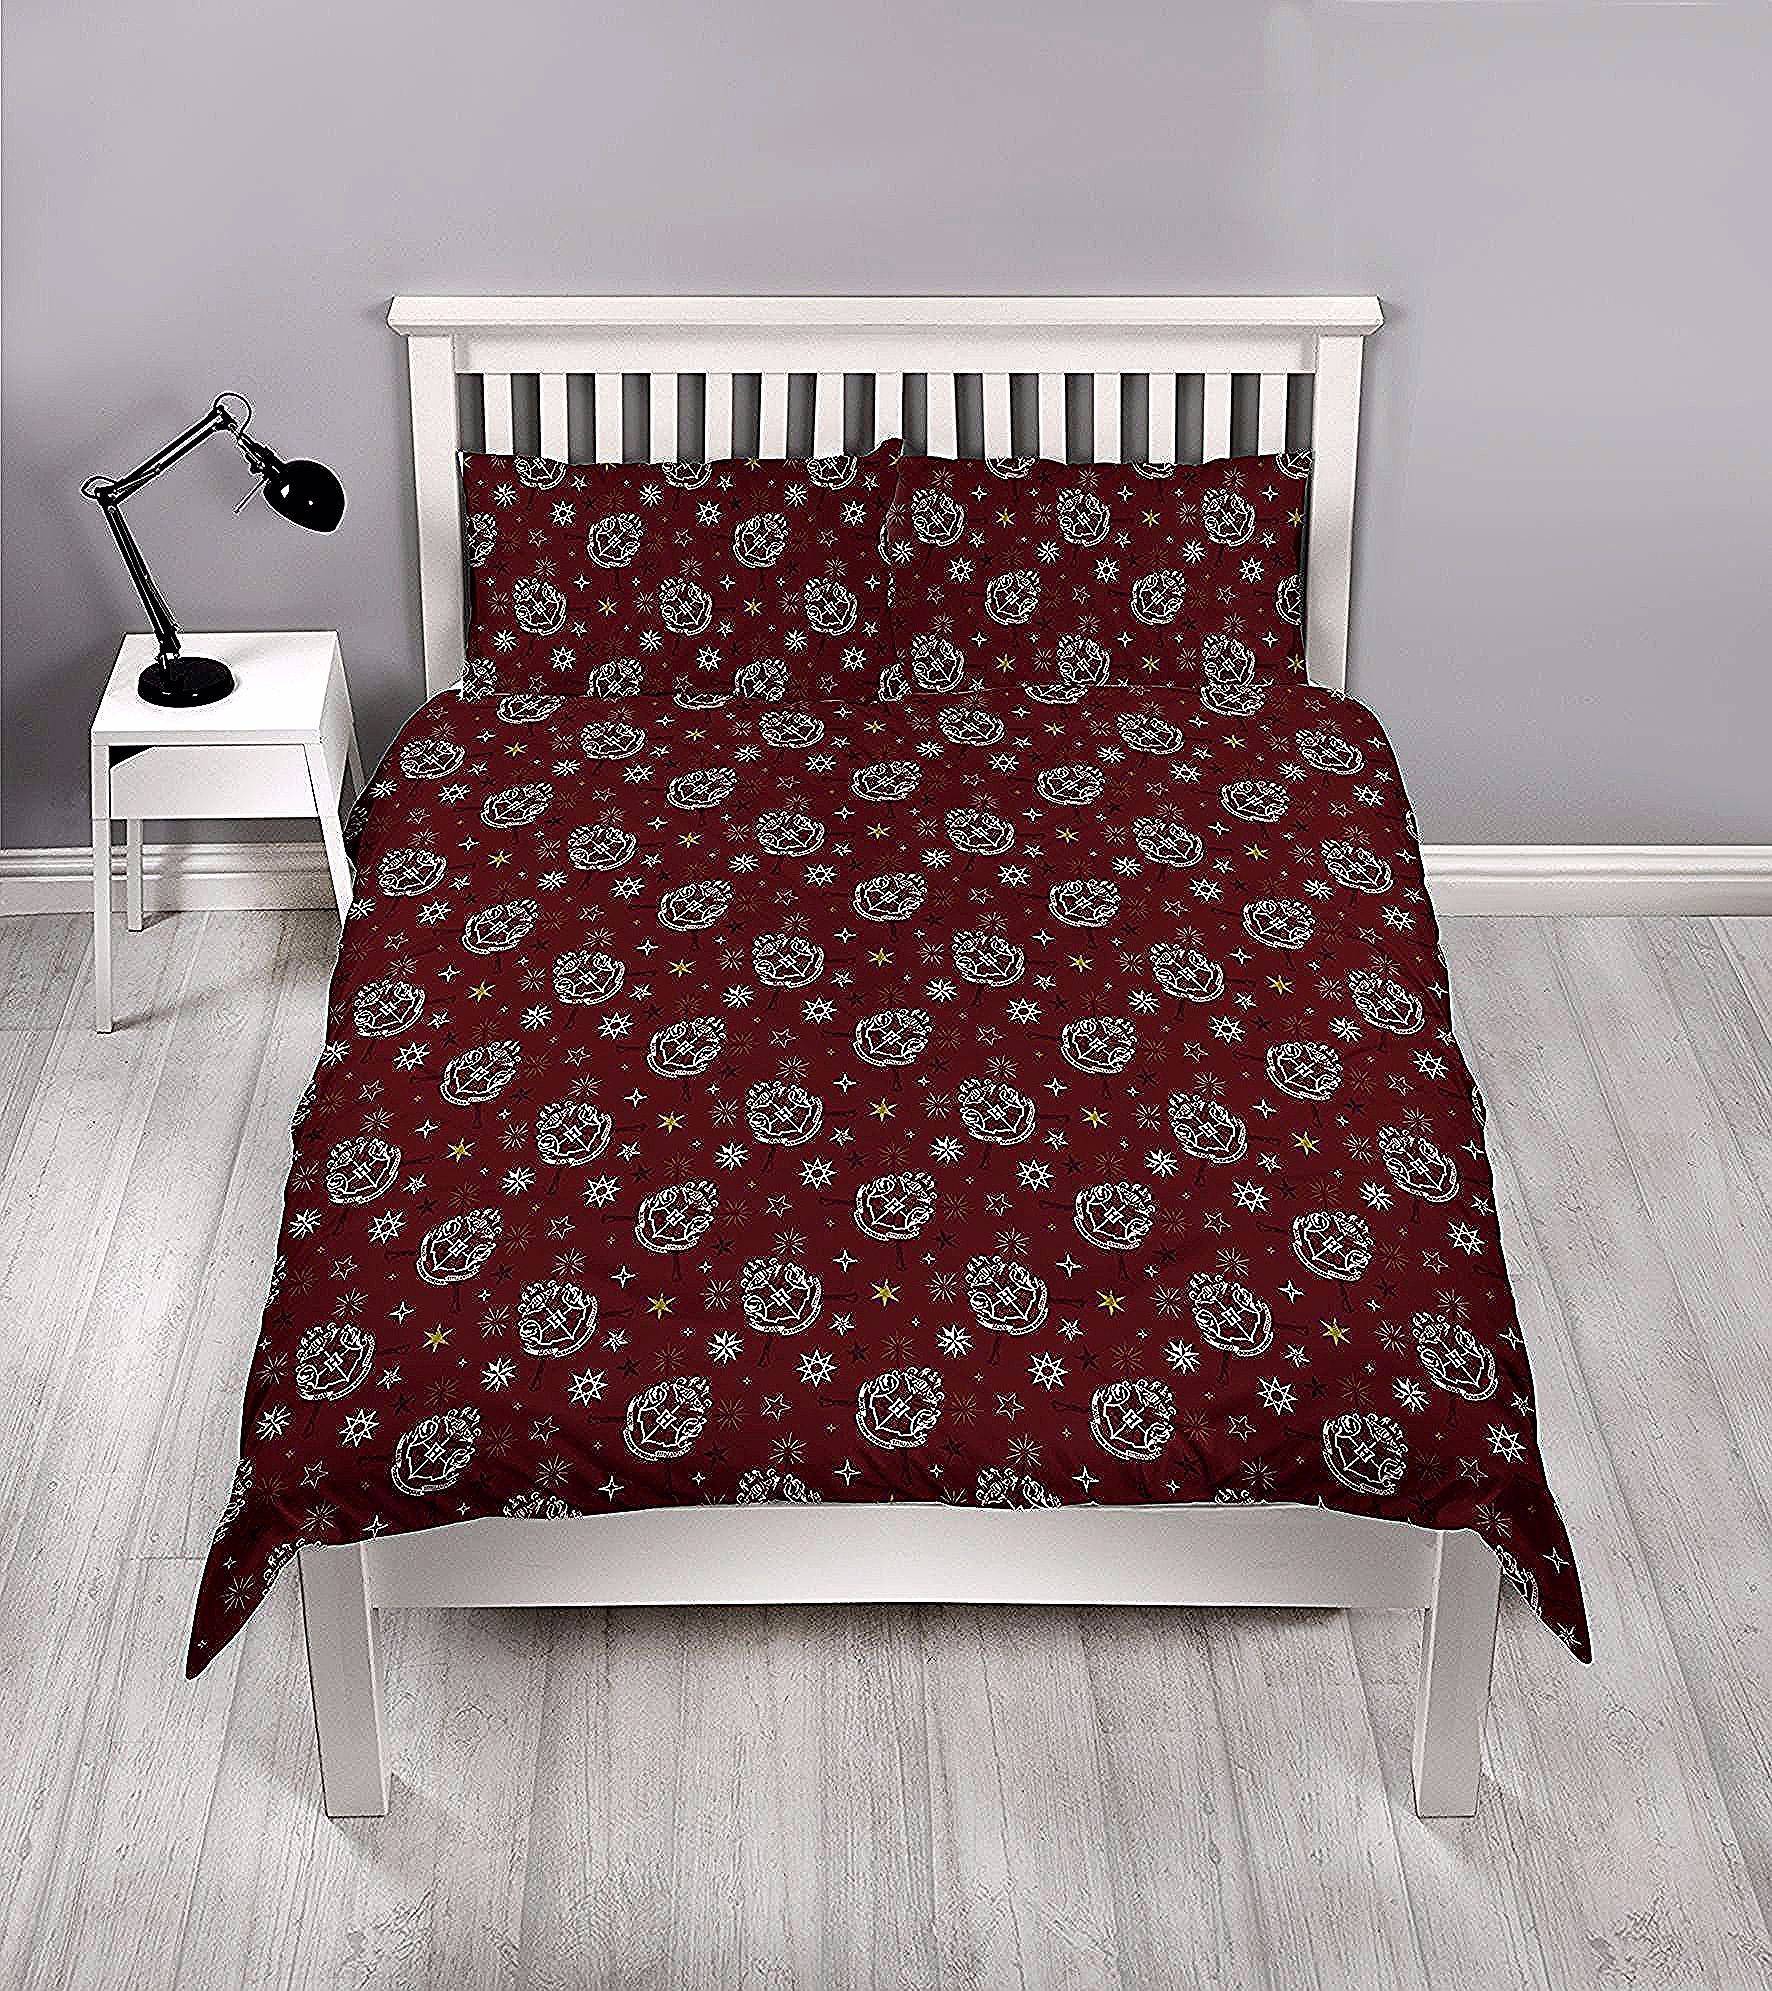 Housse De Couette Enfant In 2020 Bed Home Decor Blanket